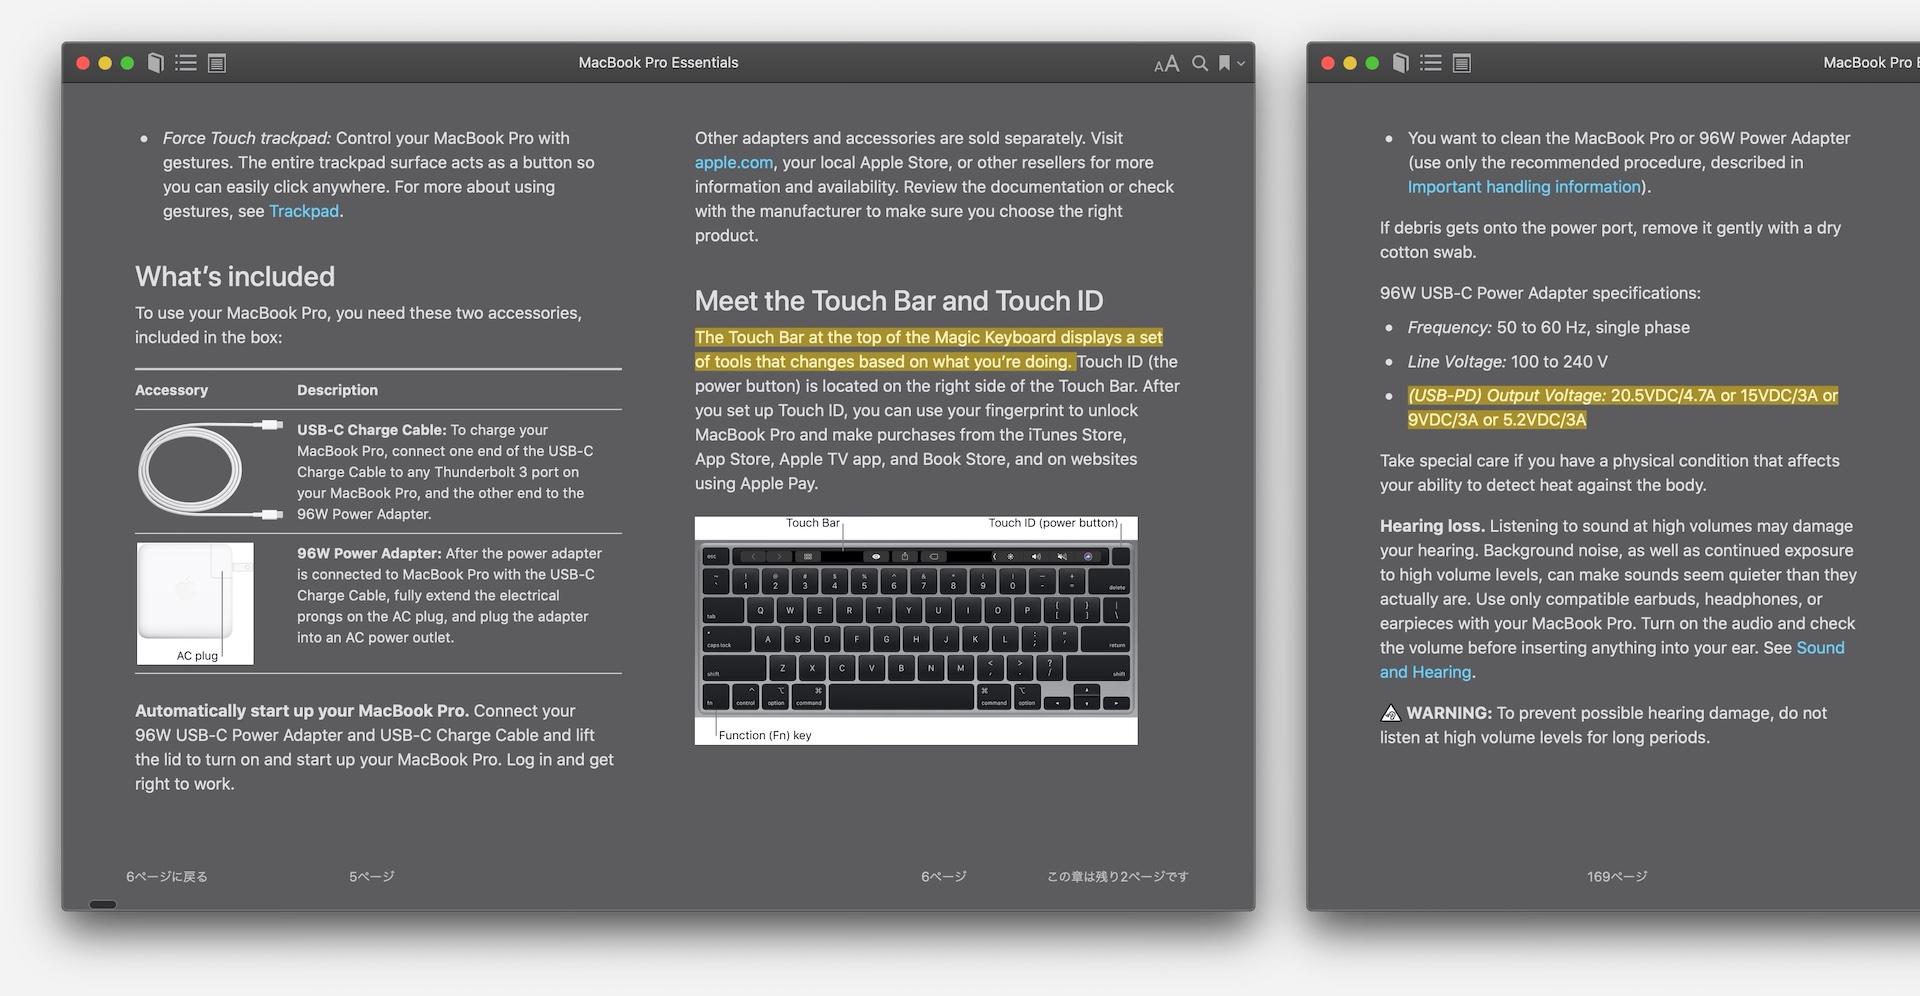 MacBook Pro (16-inch, 2019)対応のマニュアル